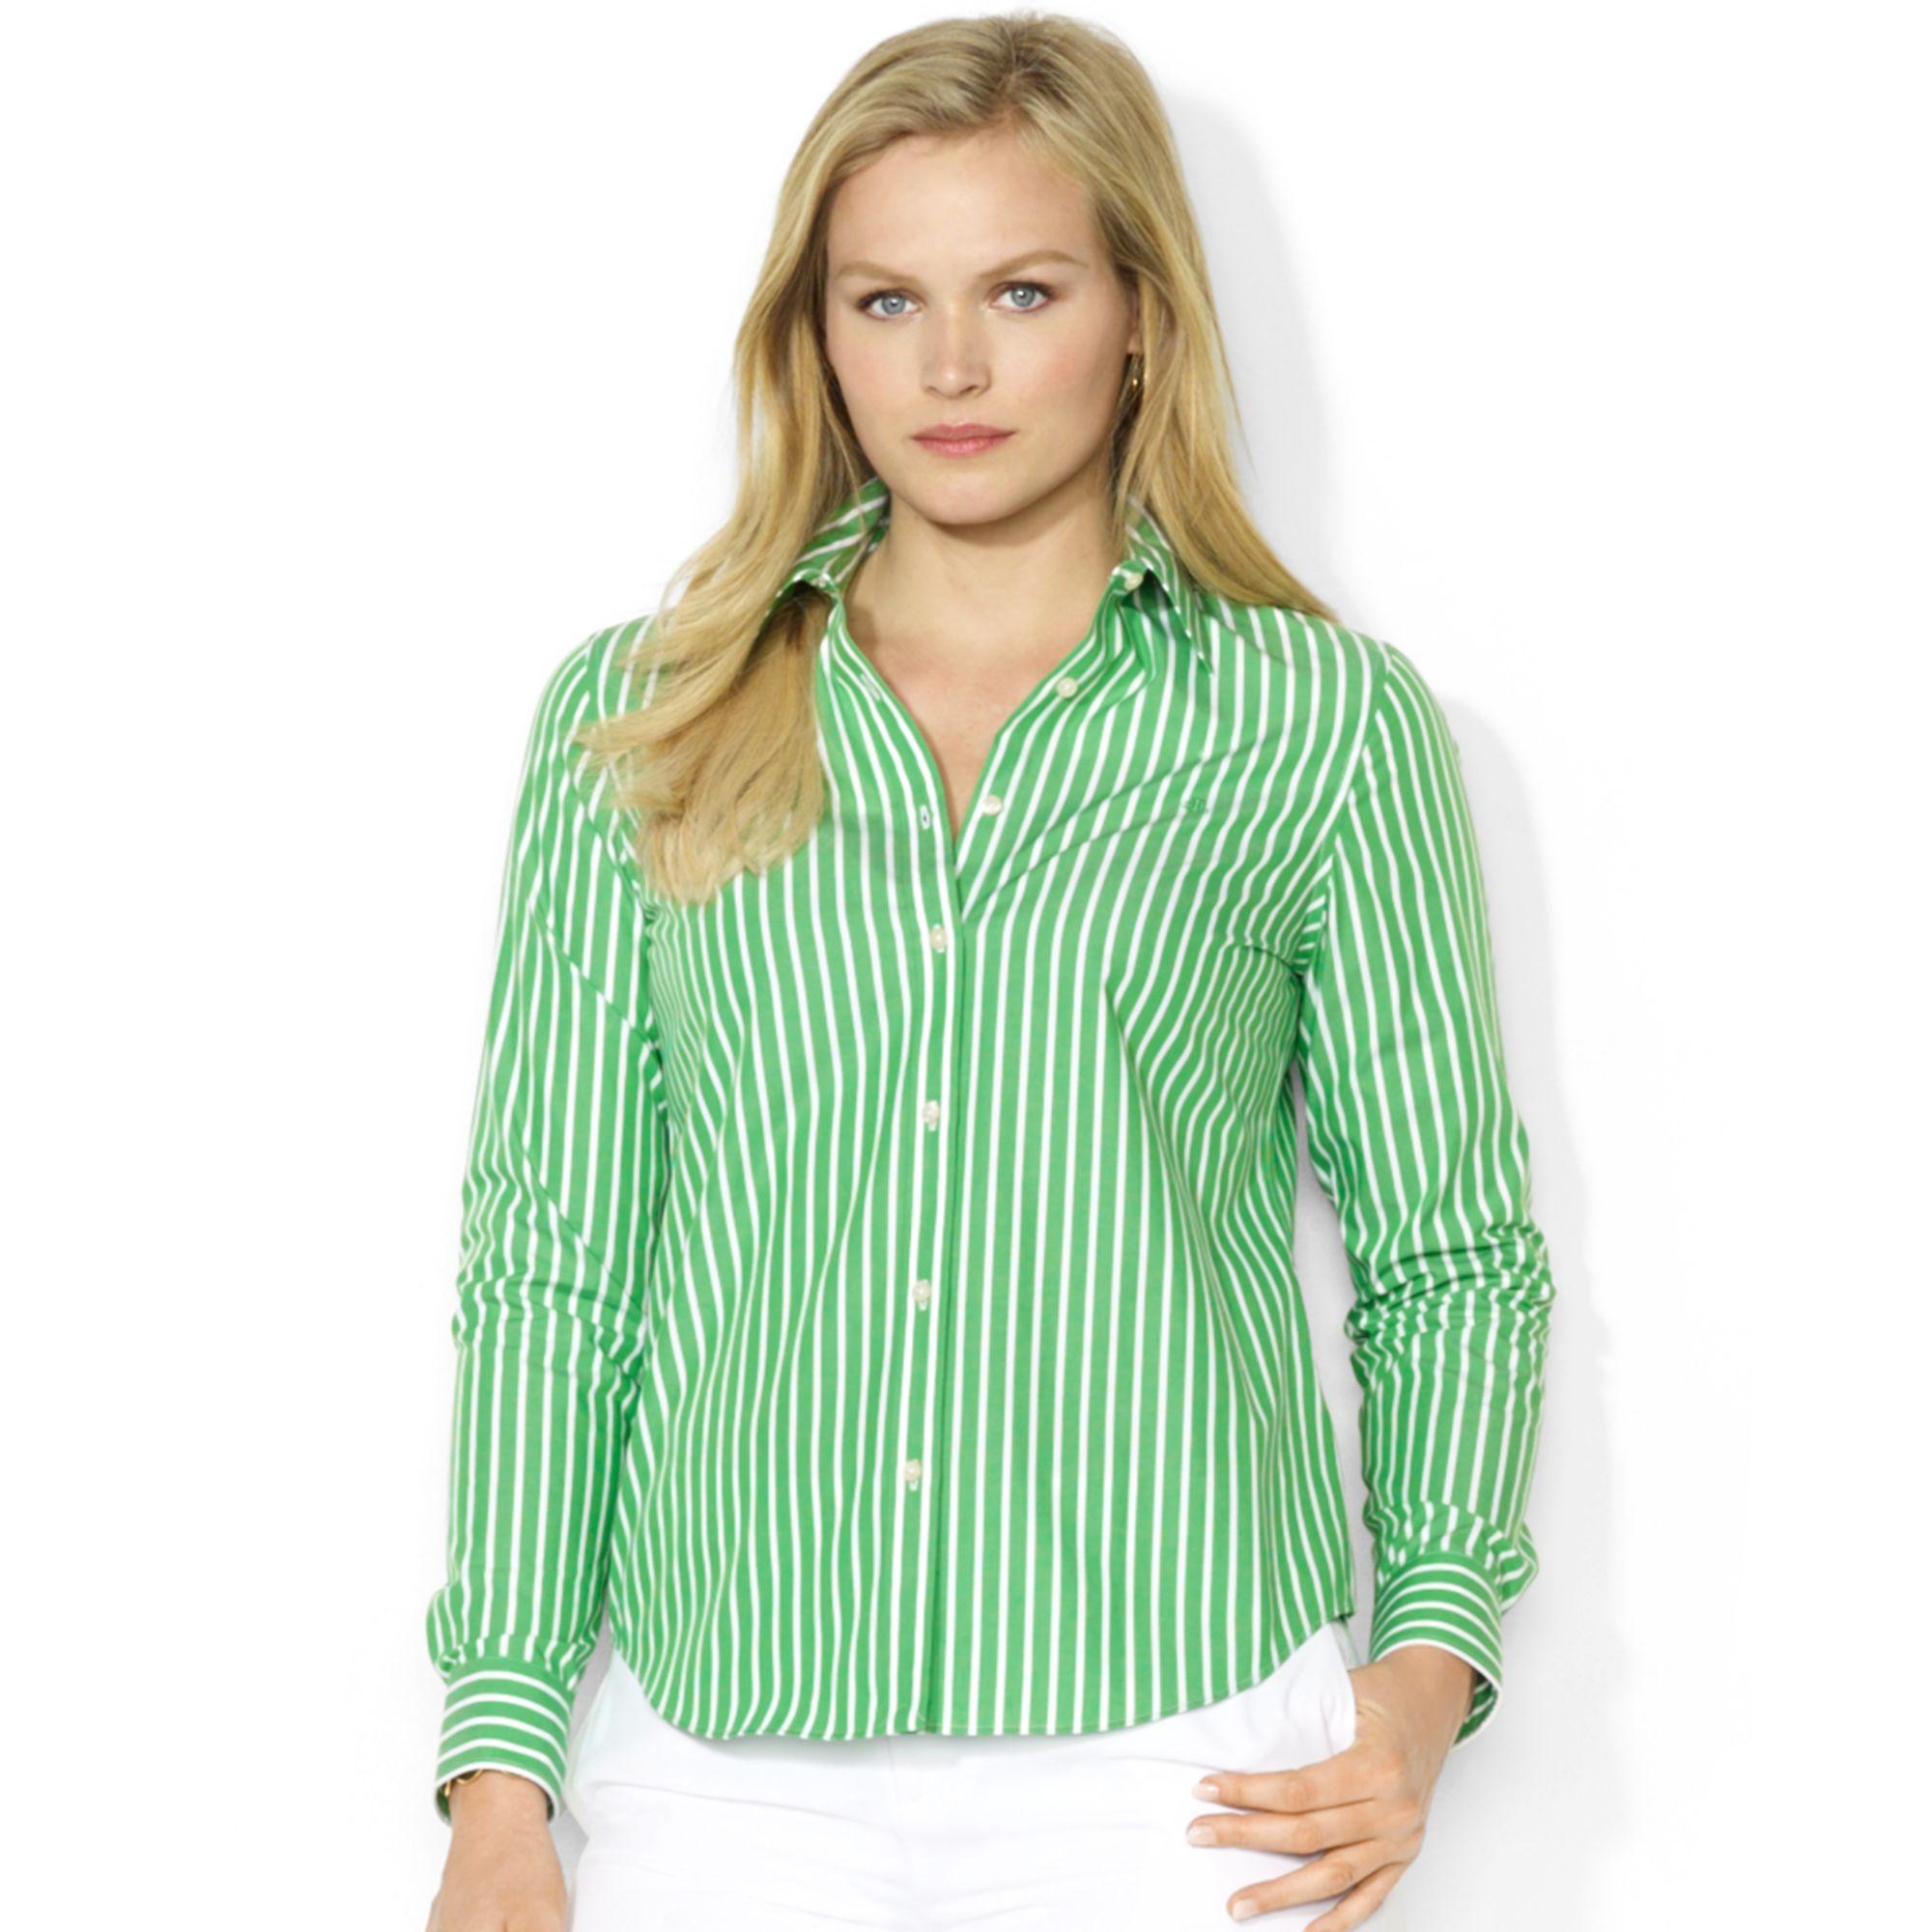 e0026390f5ed69 ... low price lyst lauren by ralph lauren plus size striped shirt in green  07898 19417